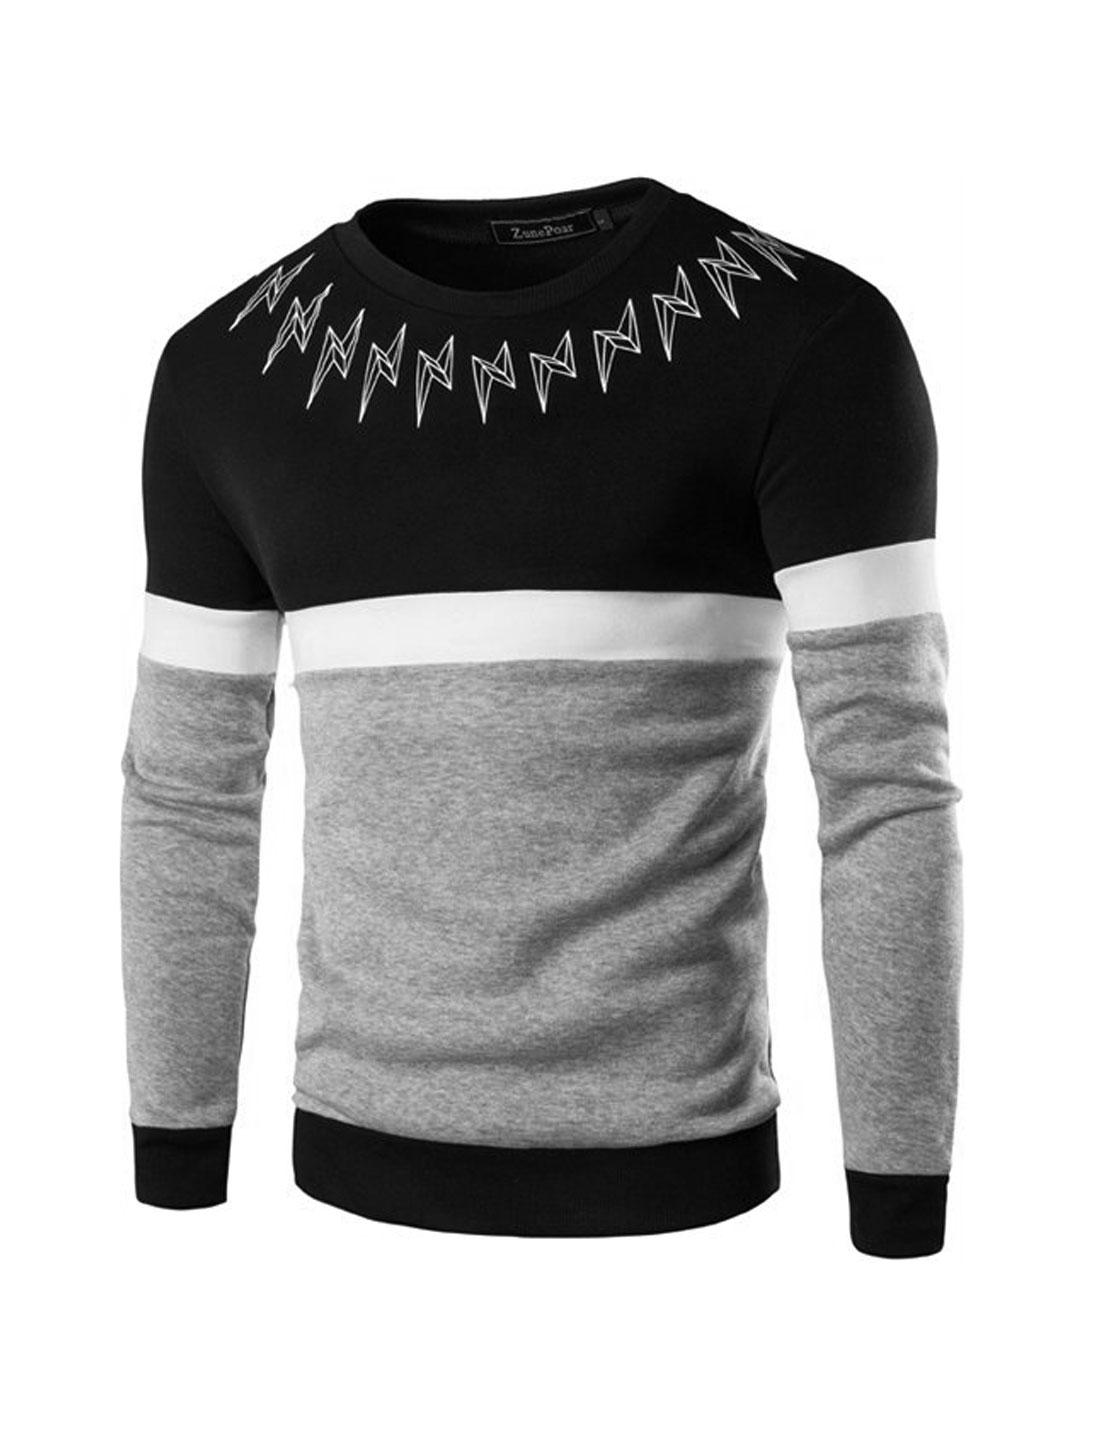 Men Color Block Lightning Prints Slim Fit Sweatshirt Black M